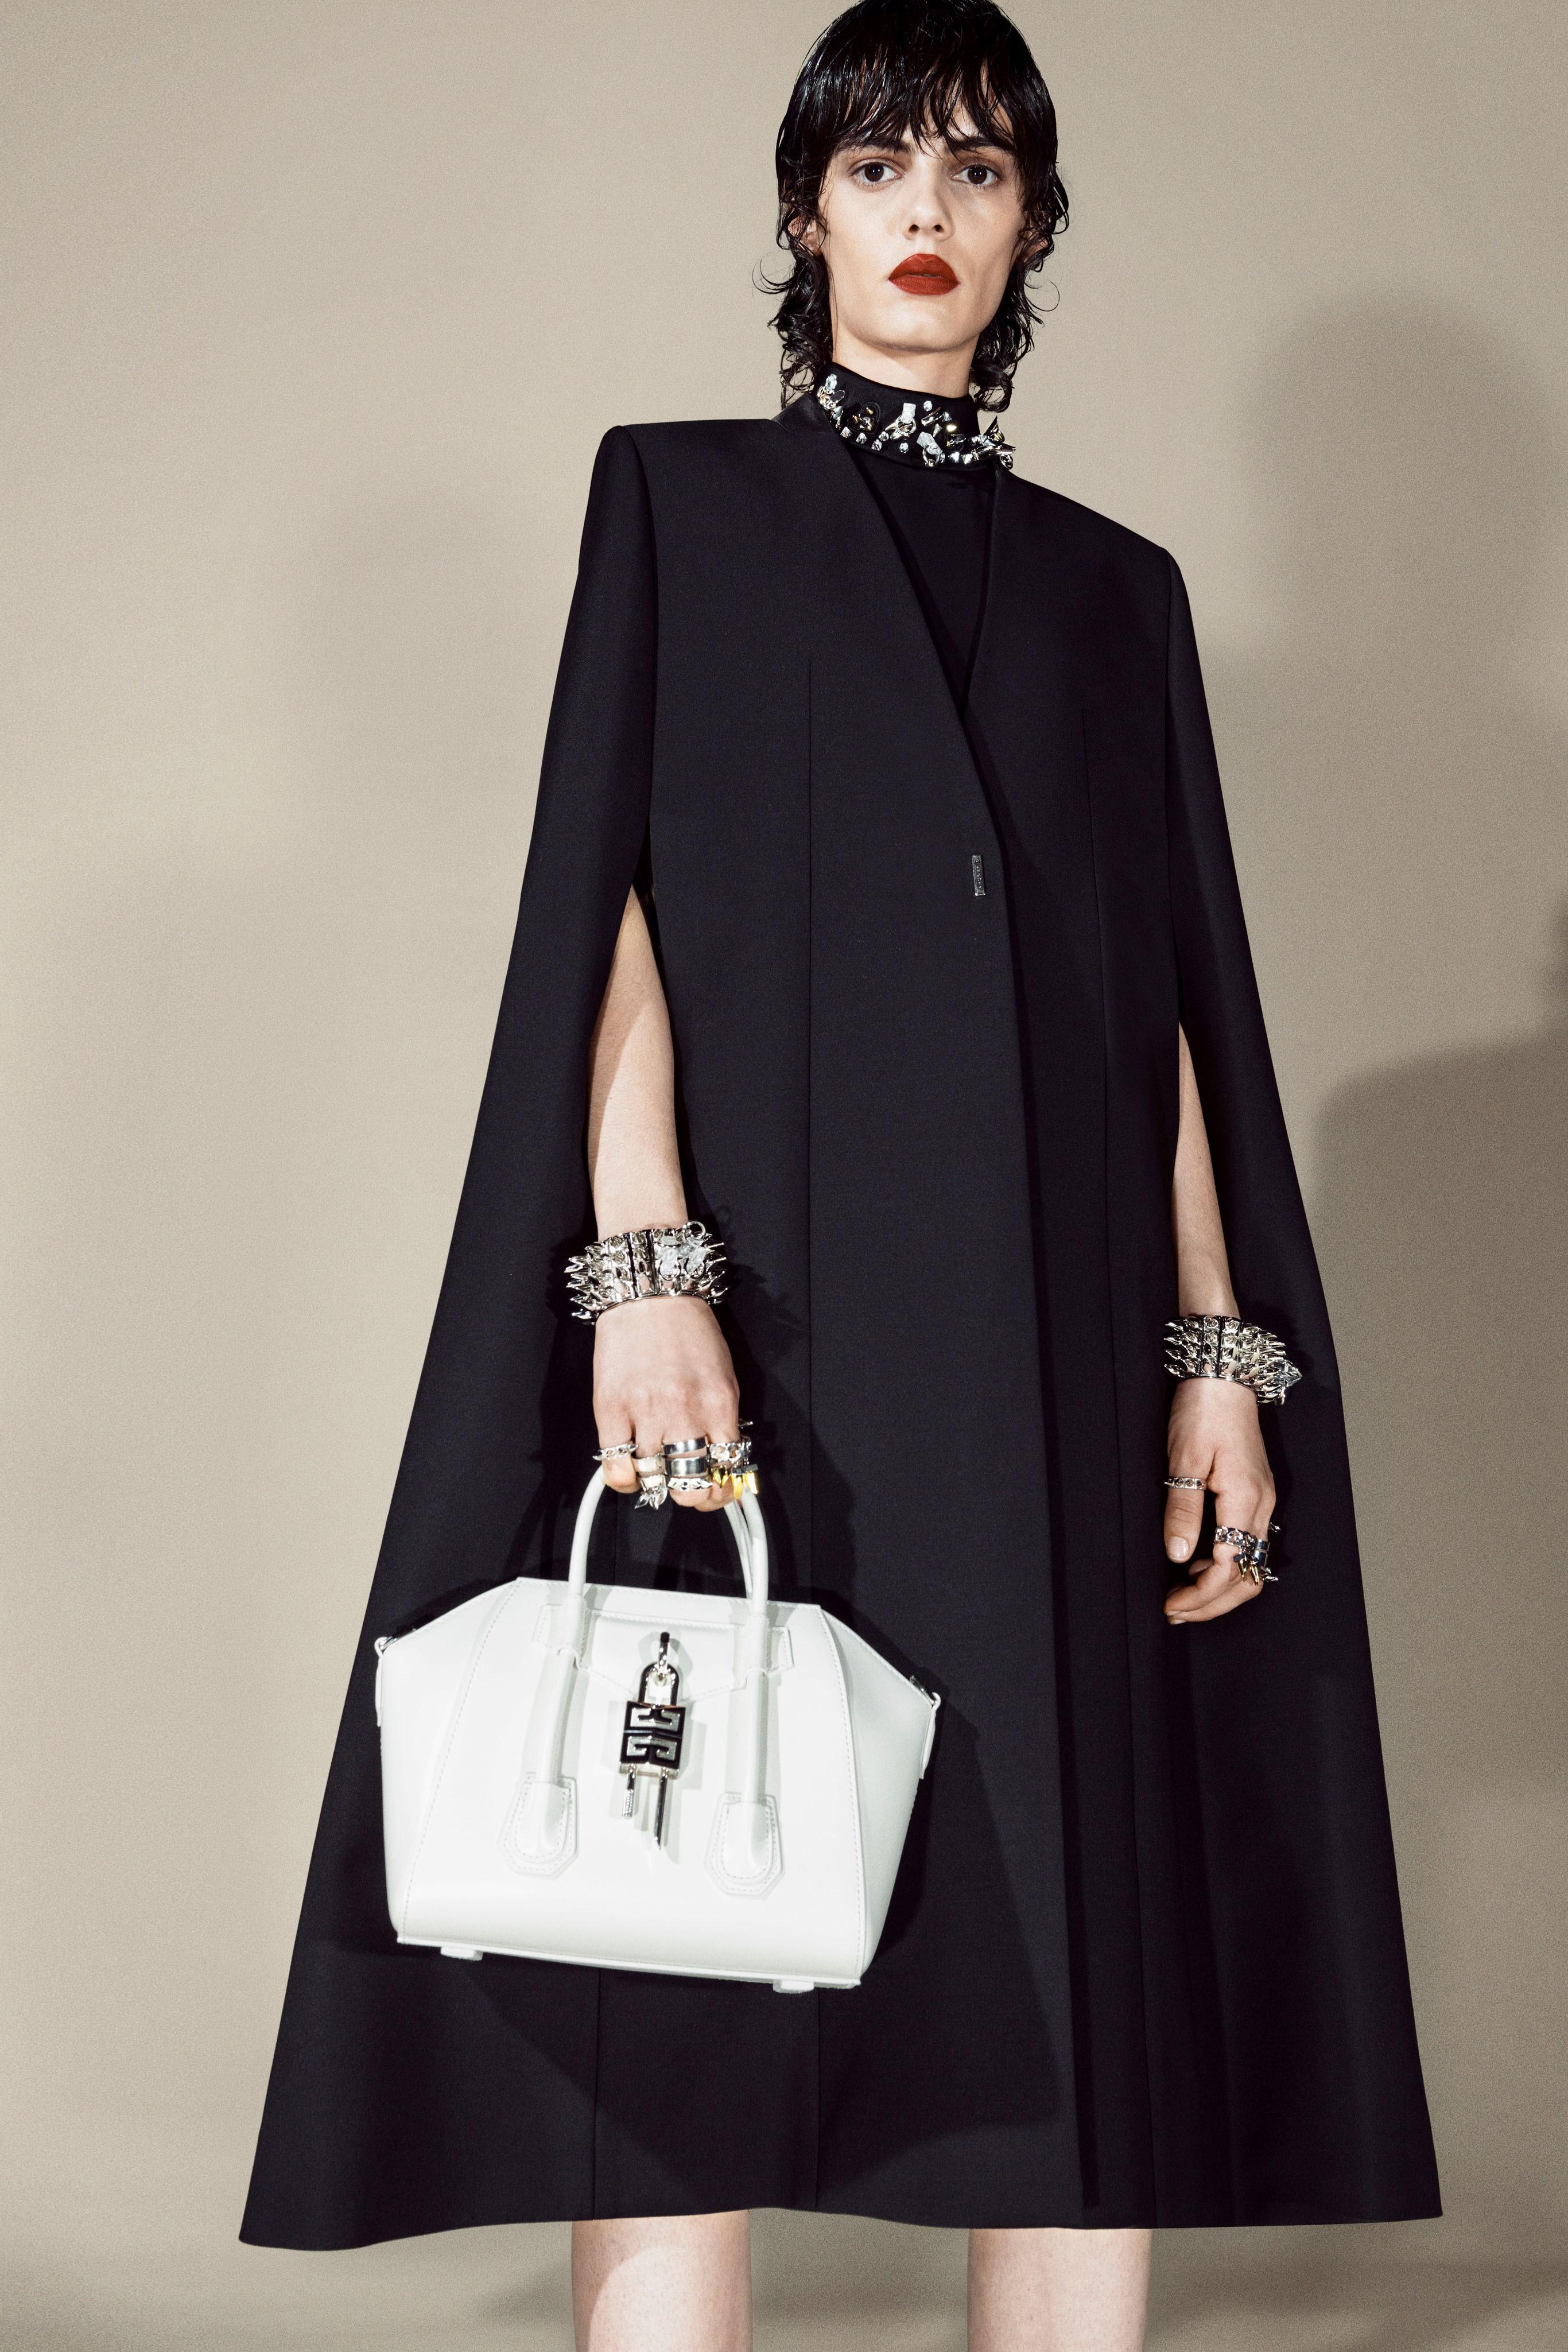 00045-Givenchy-Pre-Fall-21